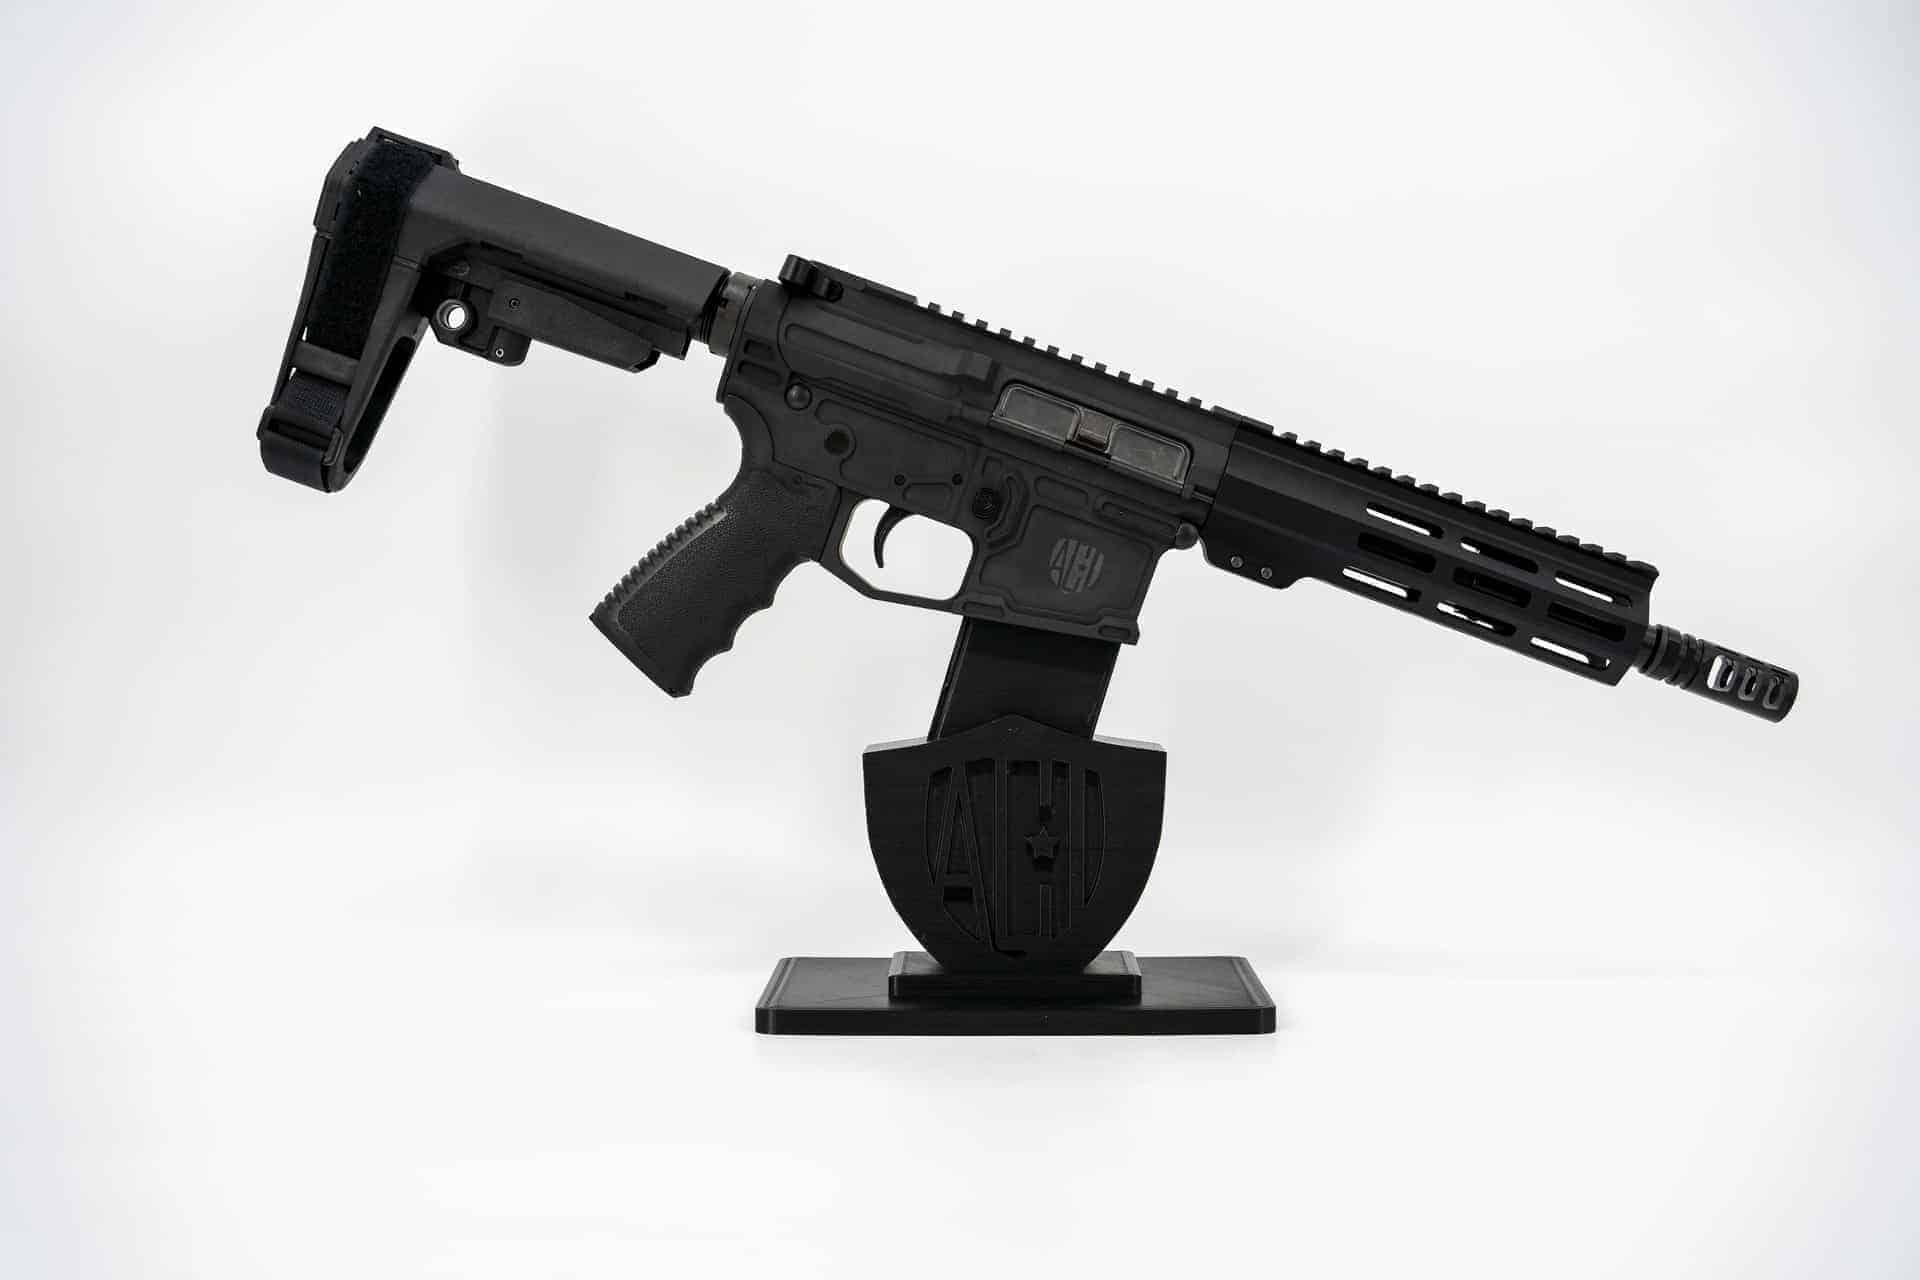 300 blackout billet 8 inch MLOK SBA3 Andro Corp AR15 Pistol